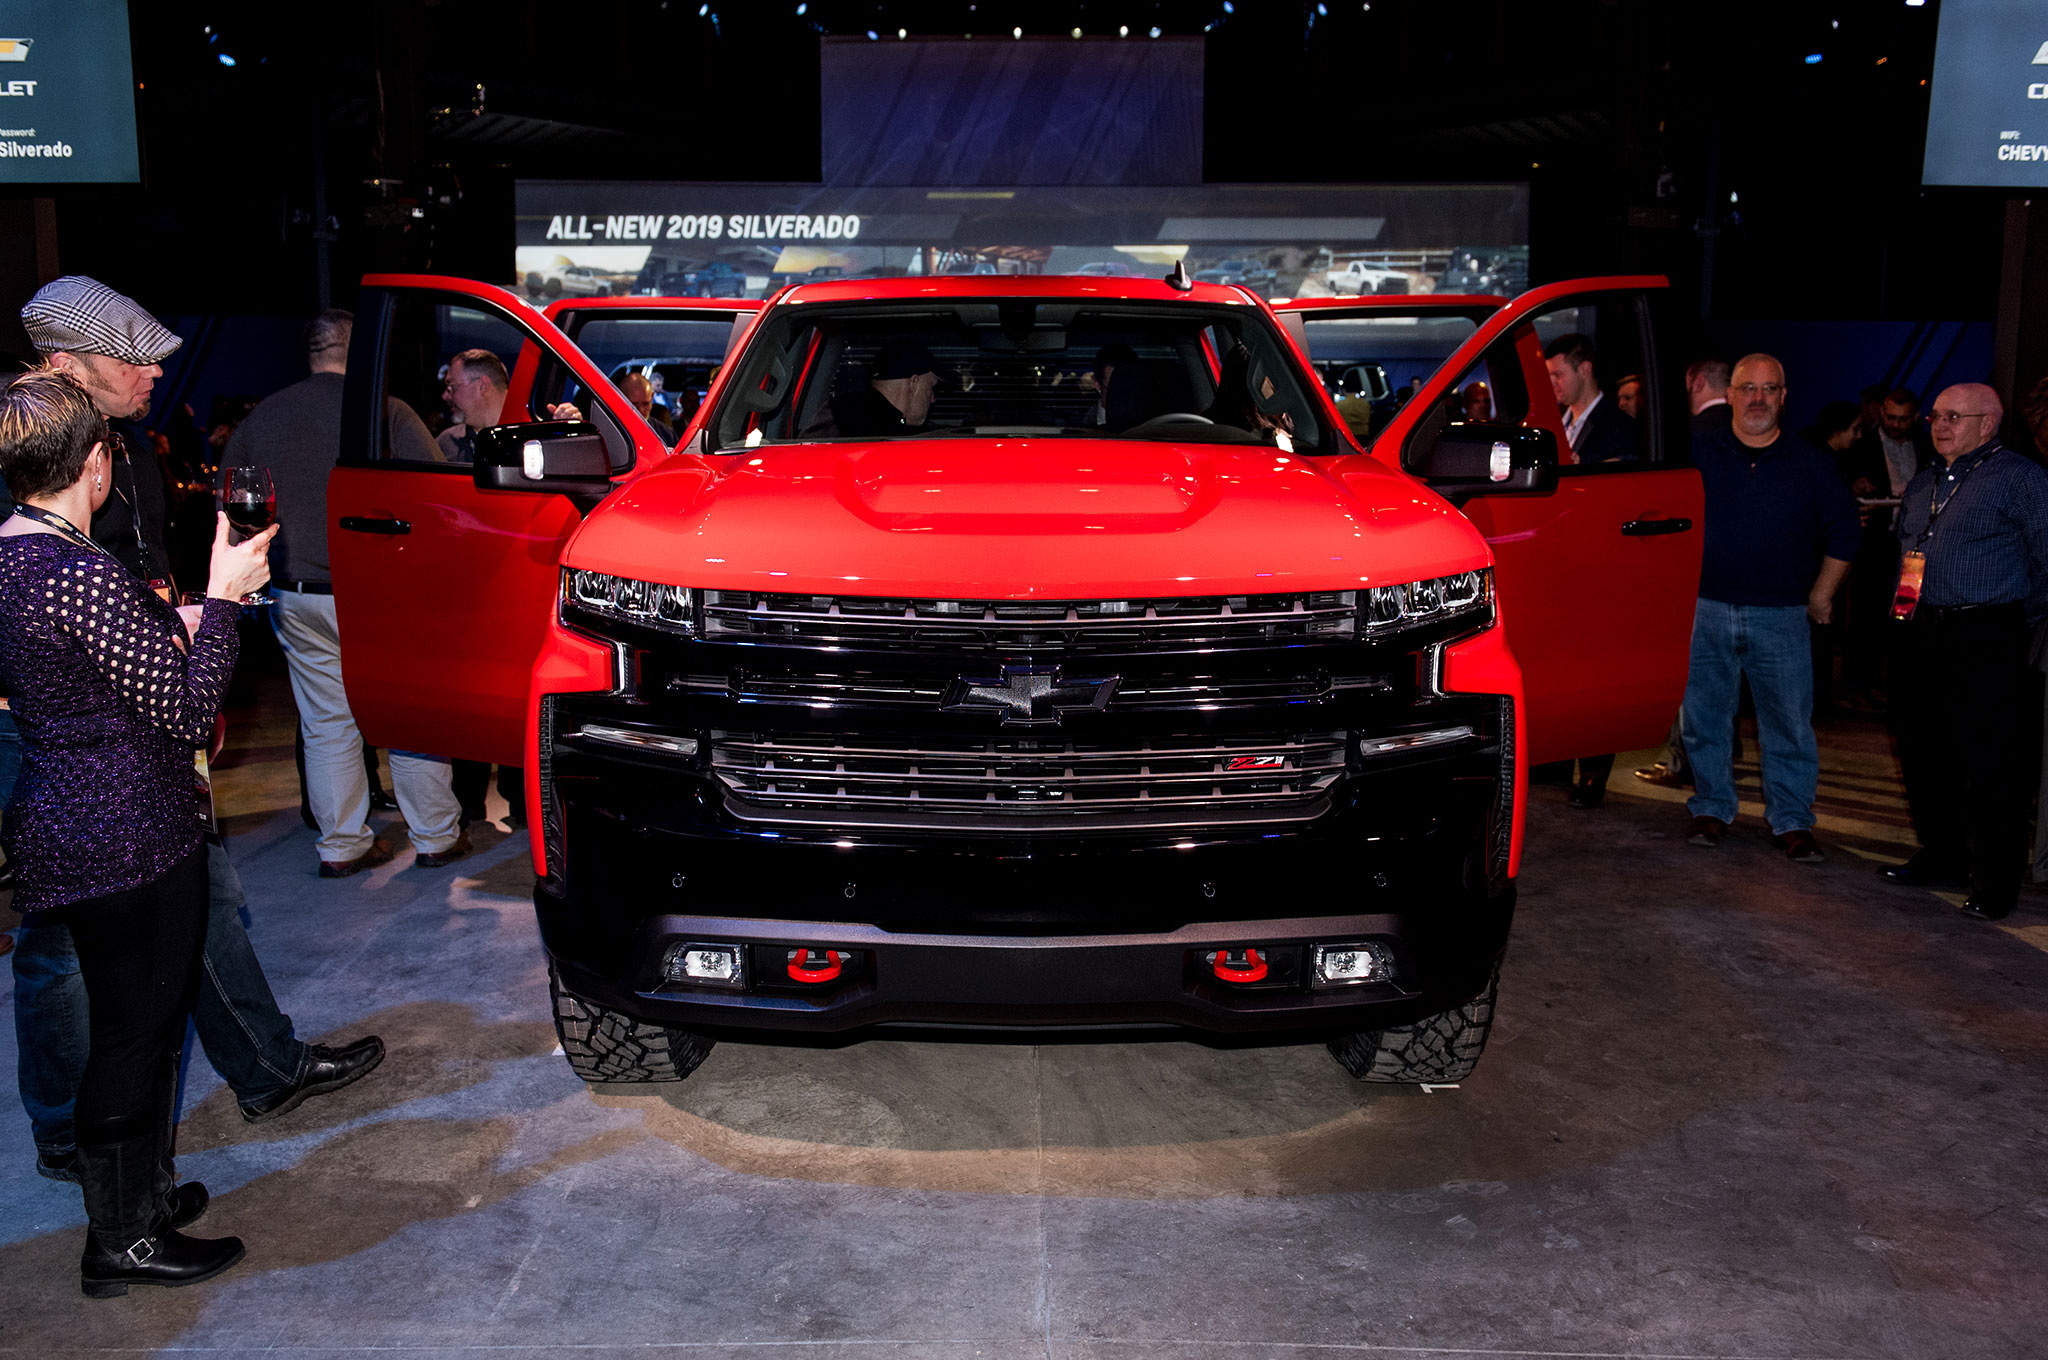 2019 Chevrolet Silverado 1500 LT Trail Boss Front View Doors Open